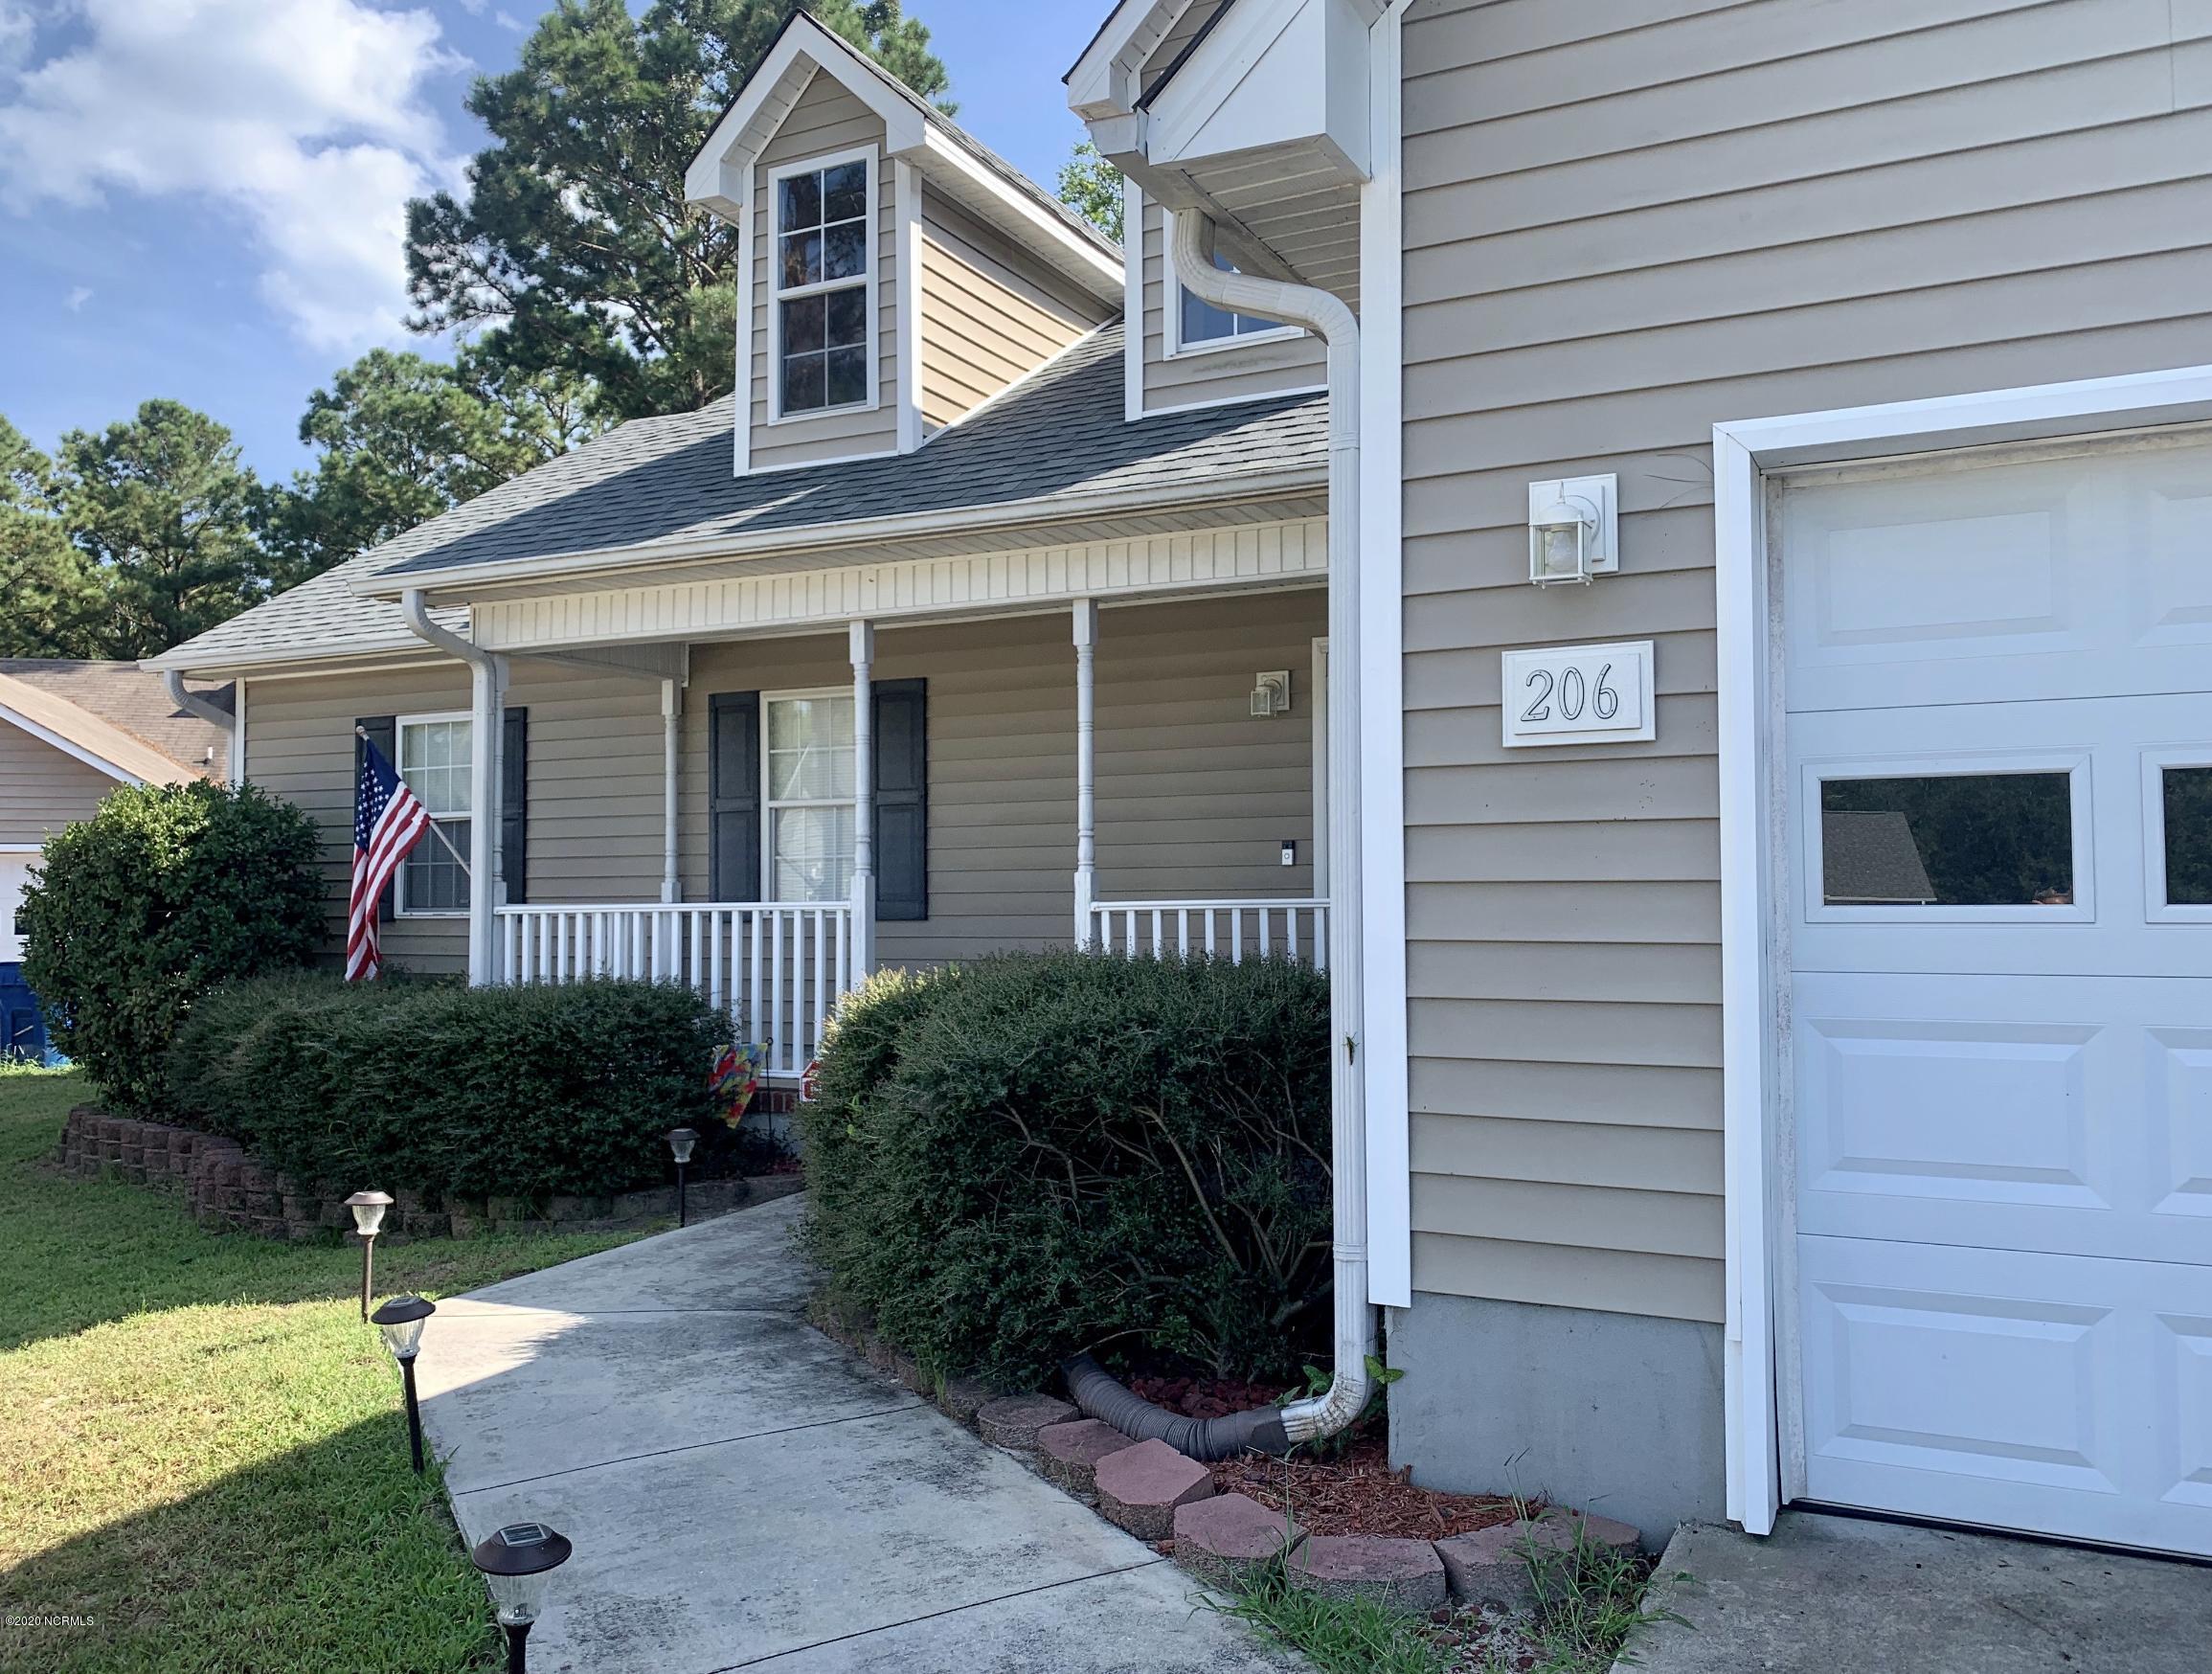 206 Bluebird Court, Sneads Ferry, North Carolina 28460, 3 Bedrooms Bedrooms, ,2 BathroomsBathrooms,Residential,For Sale,Bluebird,100235429